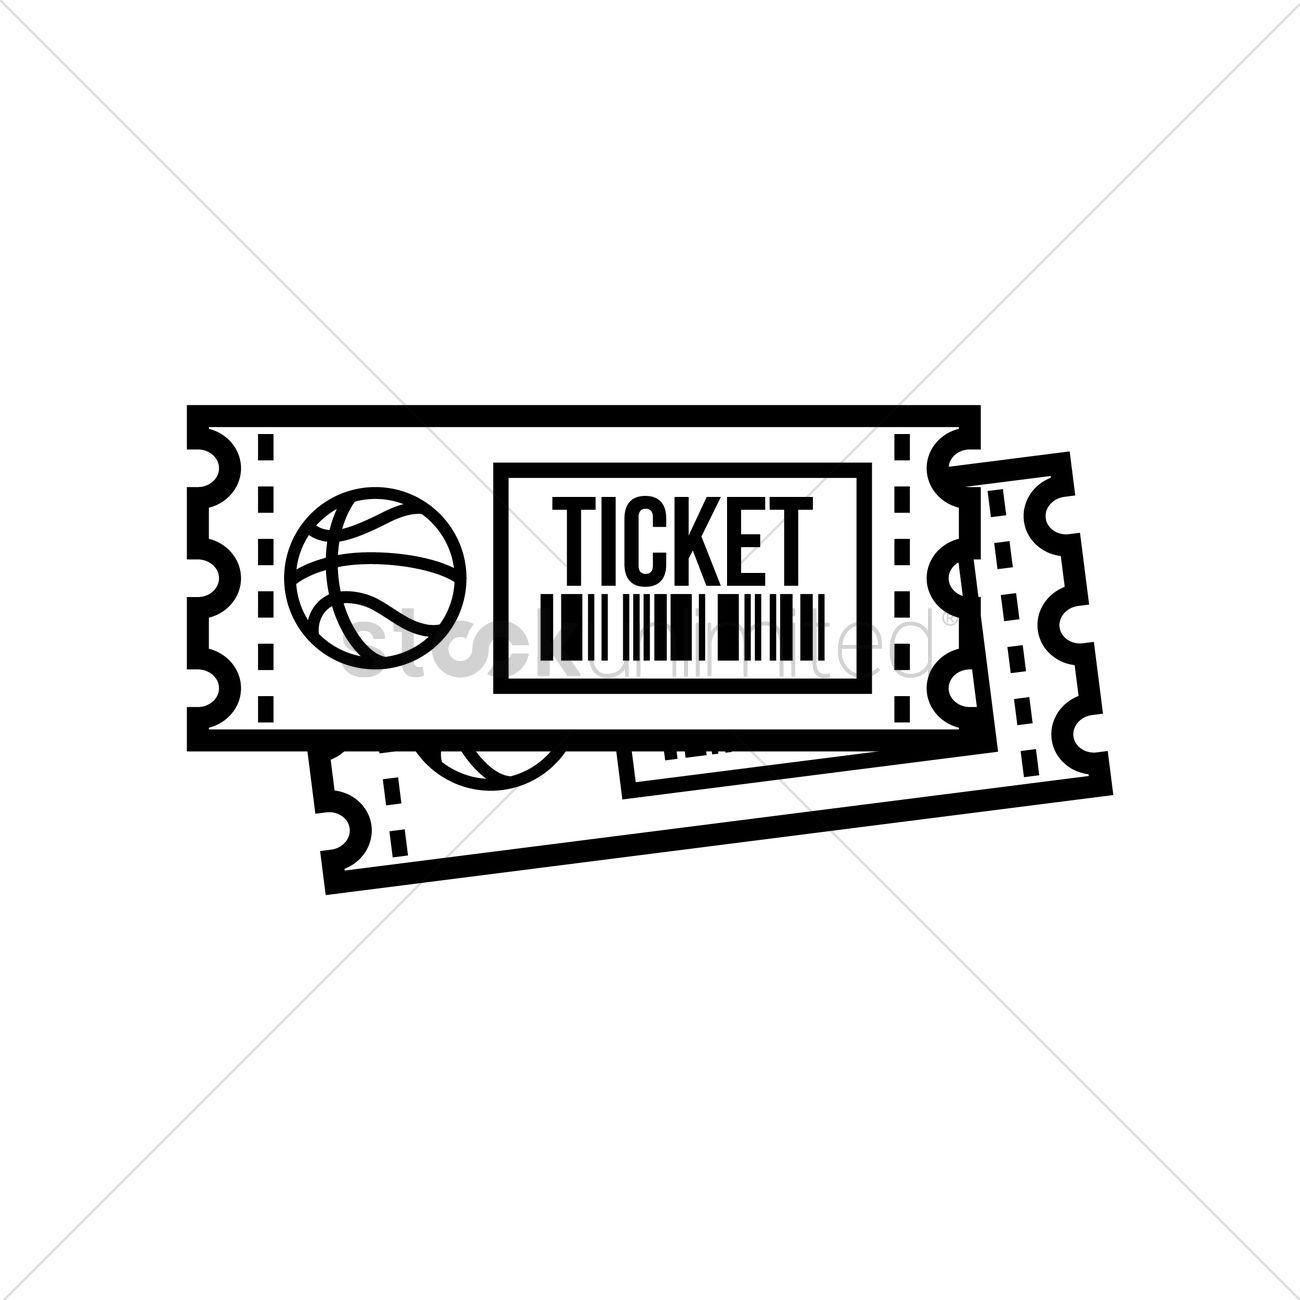 Basketball Ticket Vector Image